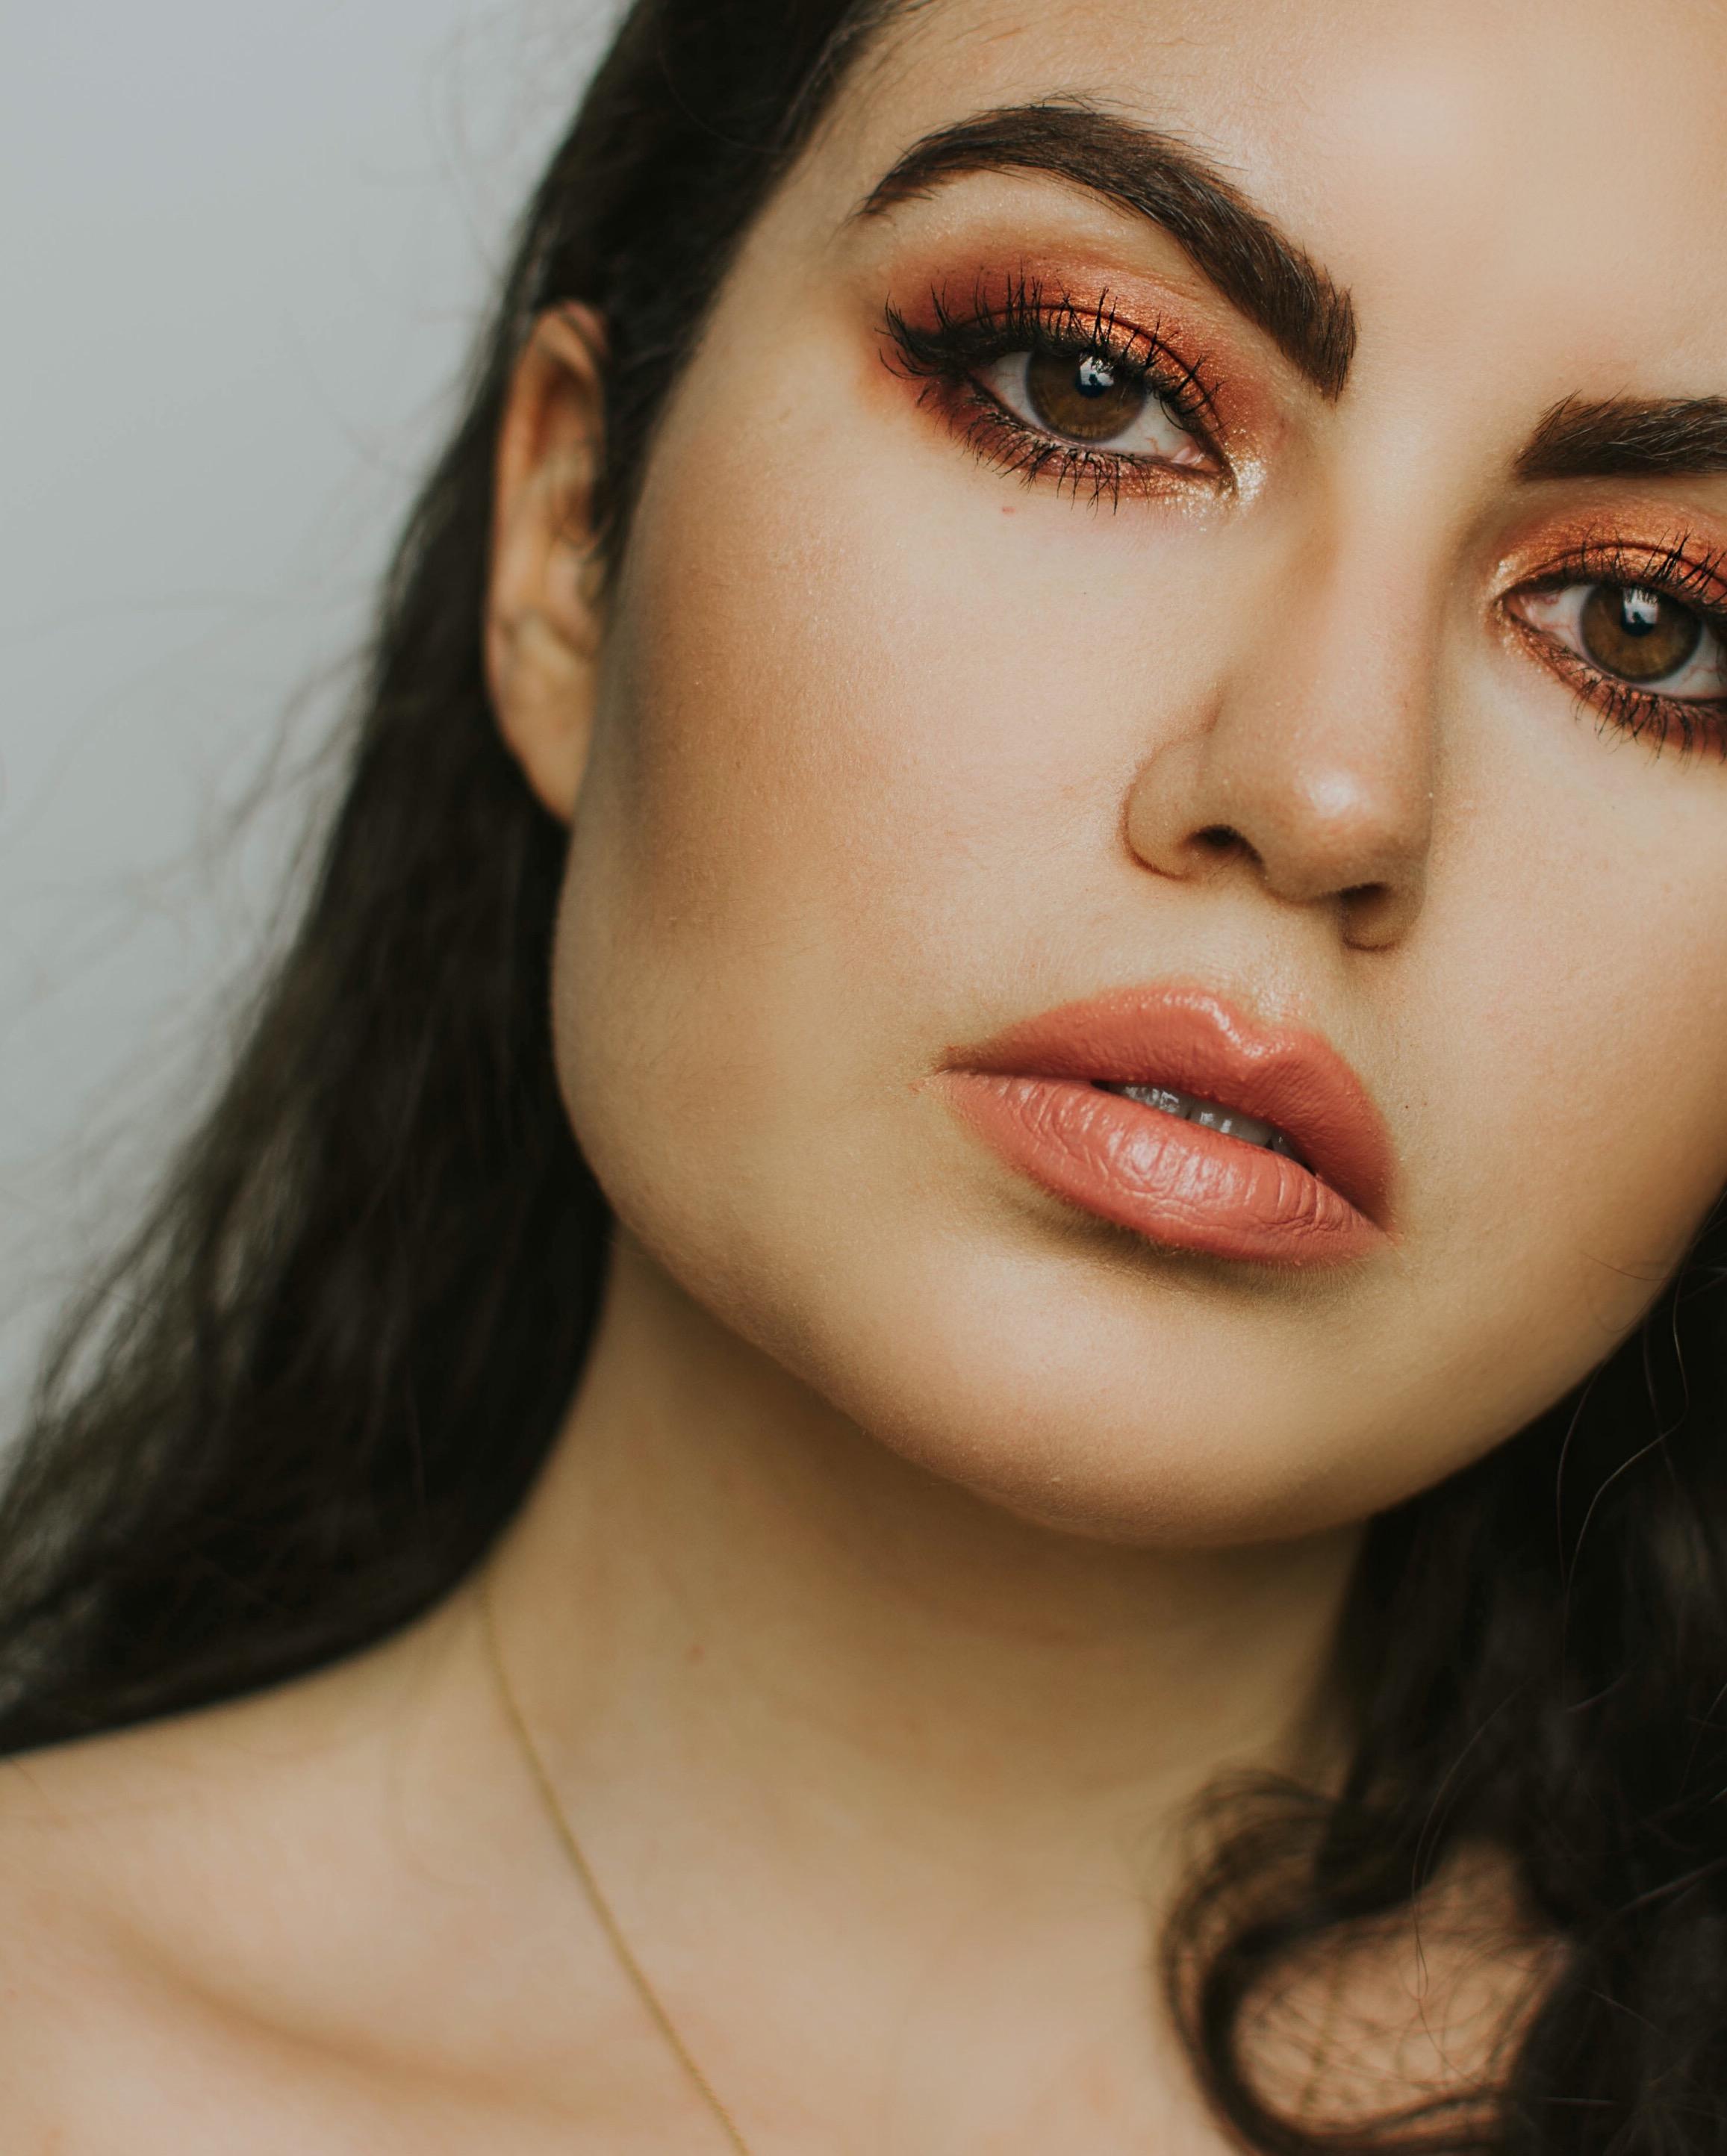 makeupbronzenude.jpg